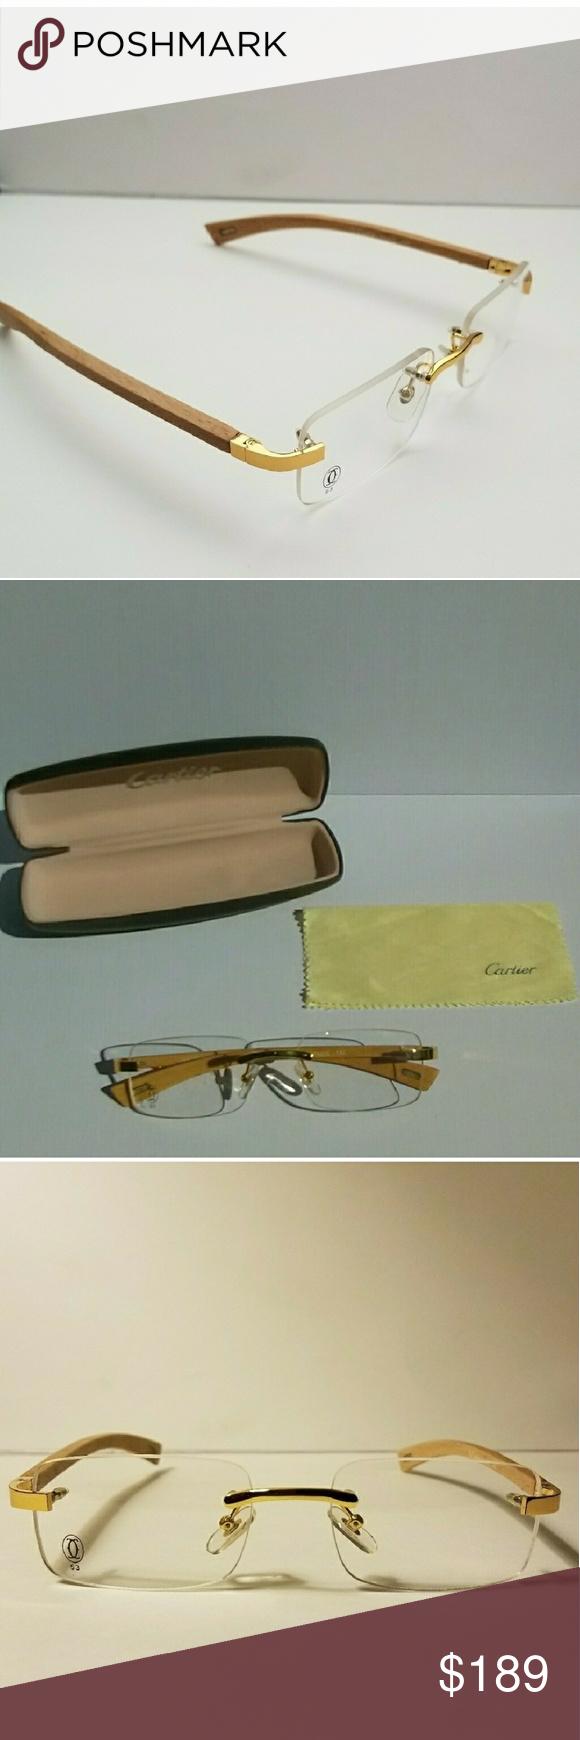 17459c45d385 Cartier Half Rim Sunglasses Tan Wood Frame « One More Soul